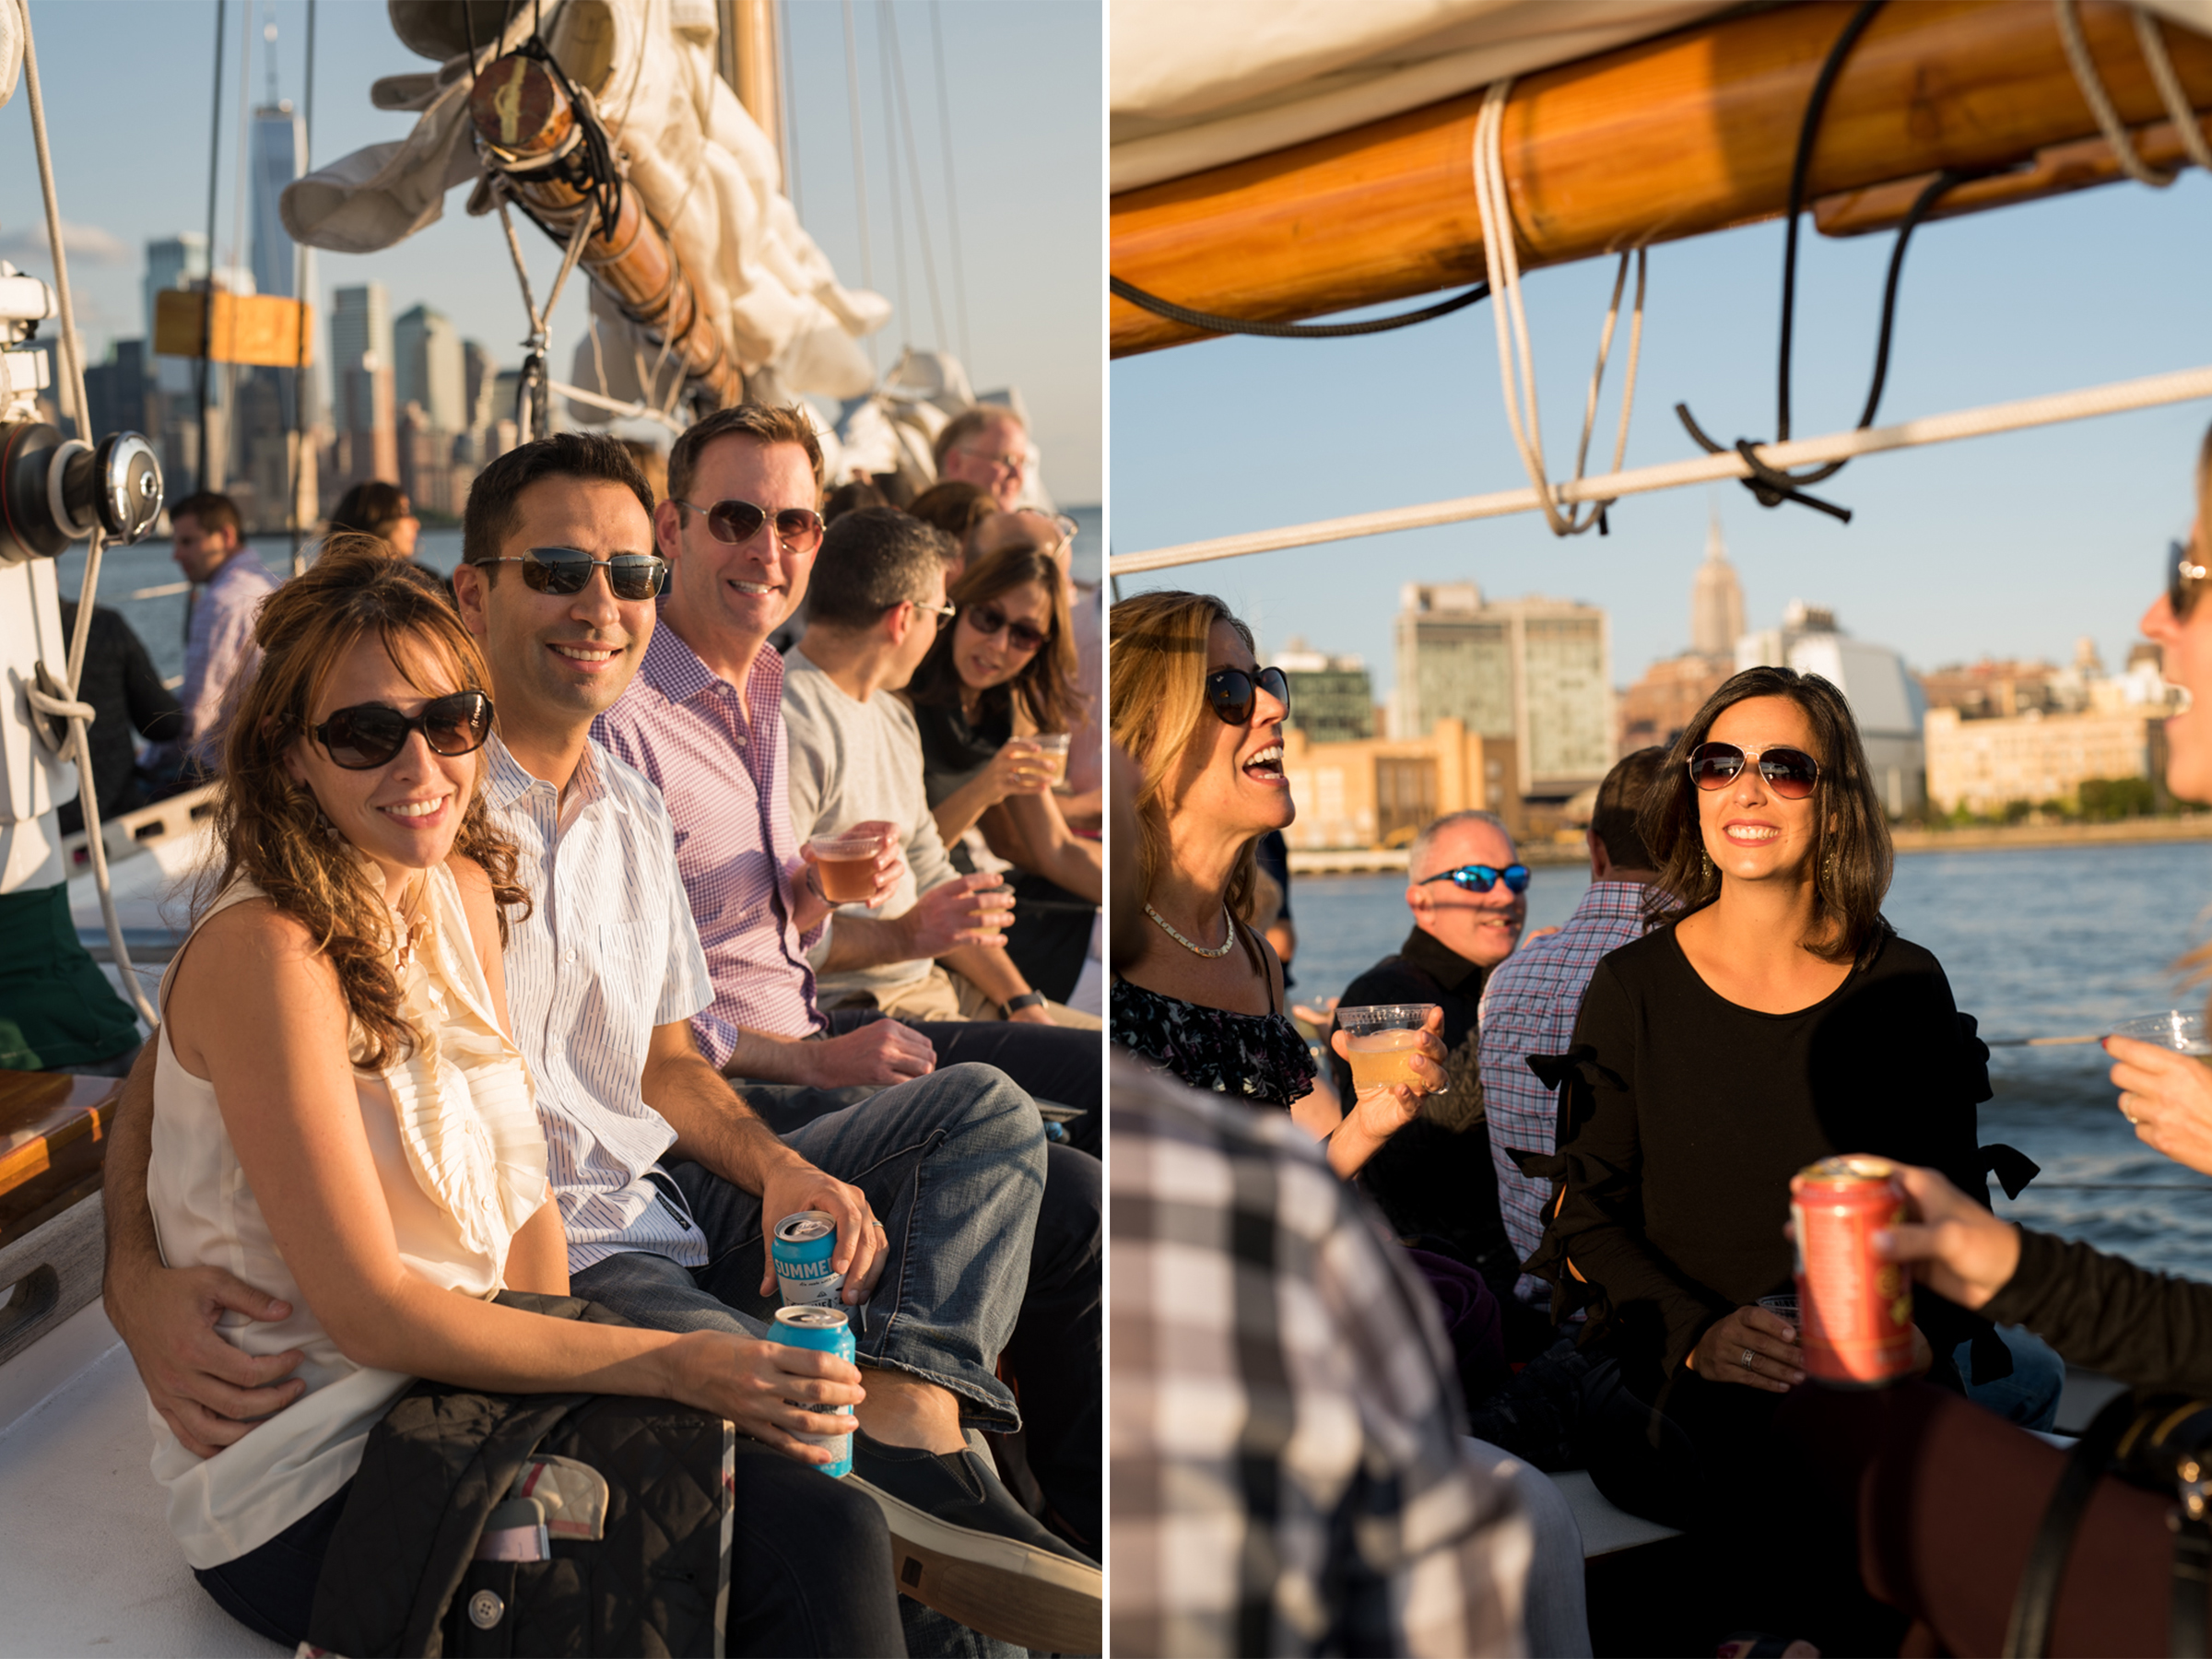 50th Birthday Party- Harborline Sunset Cruise NYC- Adirondack Schooner 2- Olivia Christina Photo.jpg